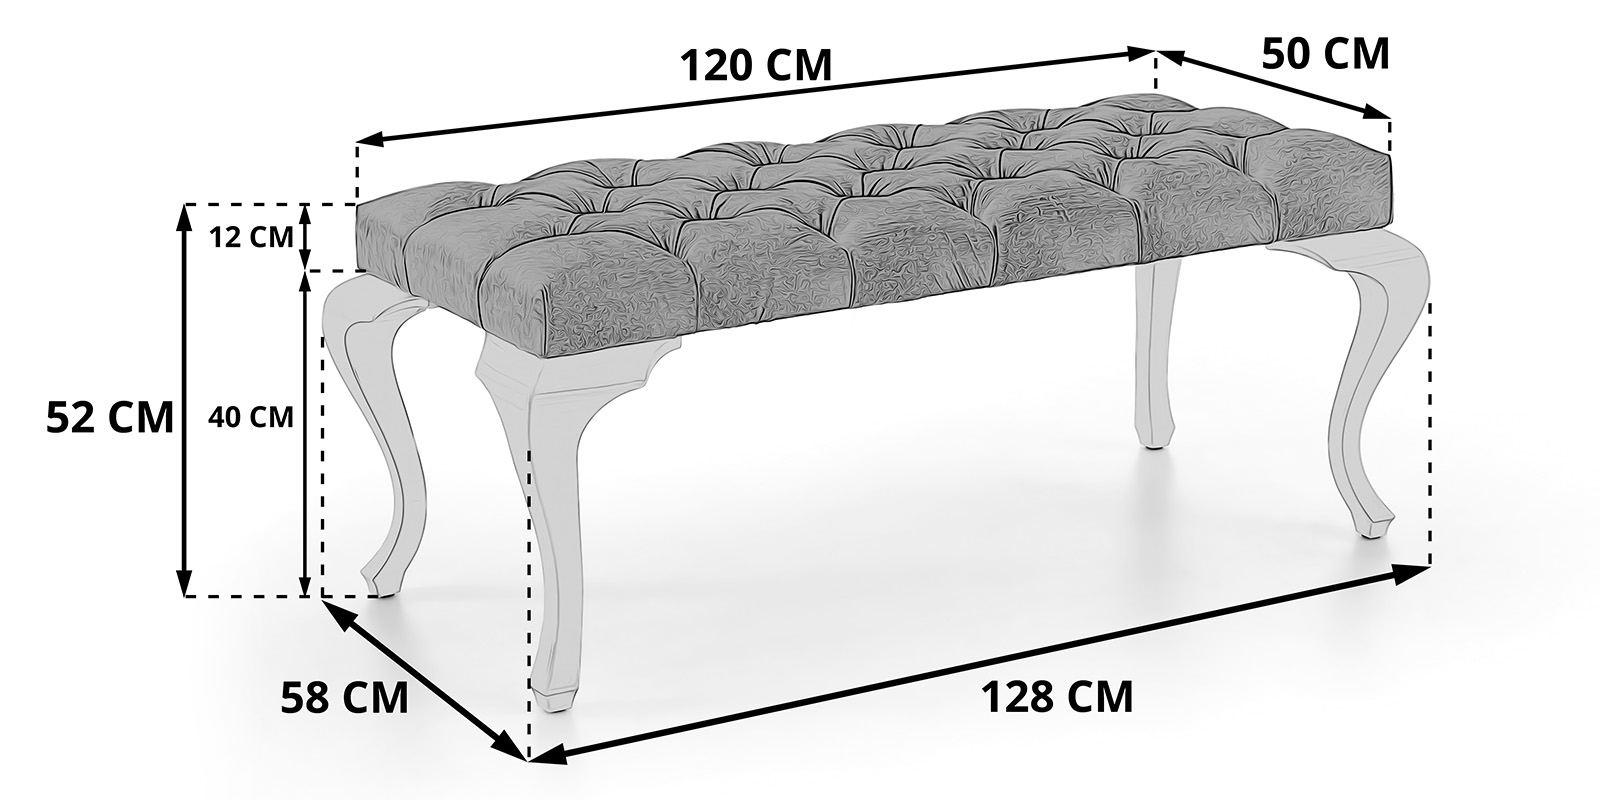 sitzbank-schlafzimmer-barock-skizze | Moebella24